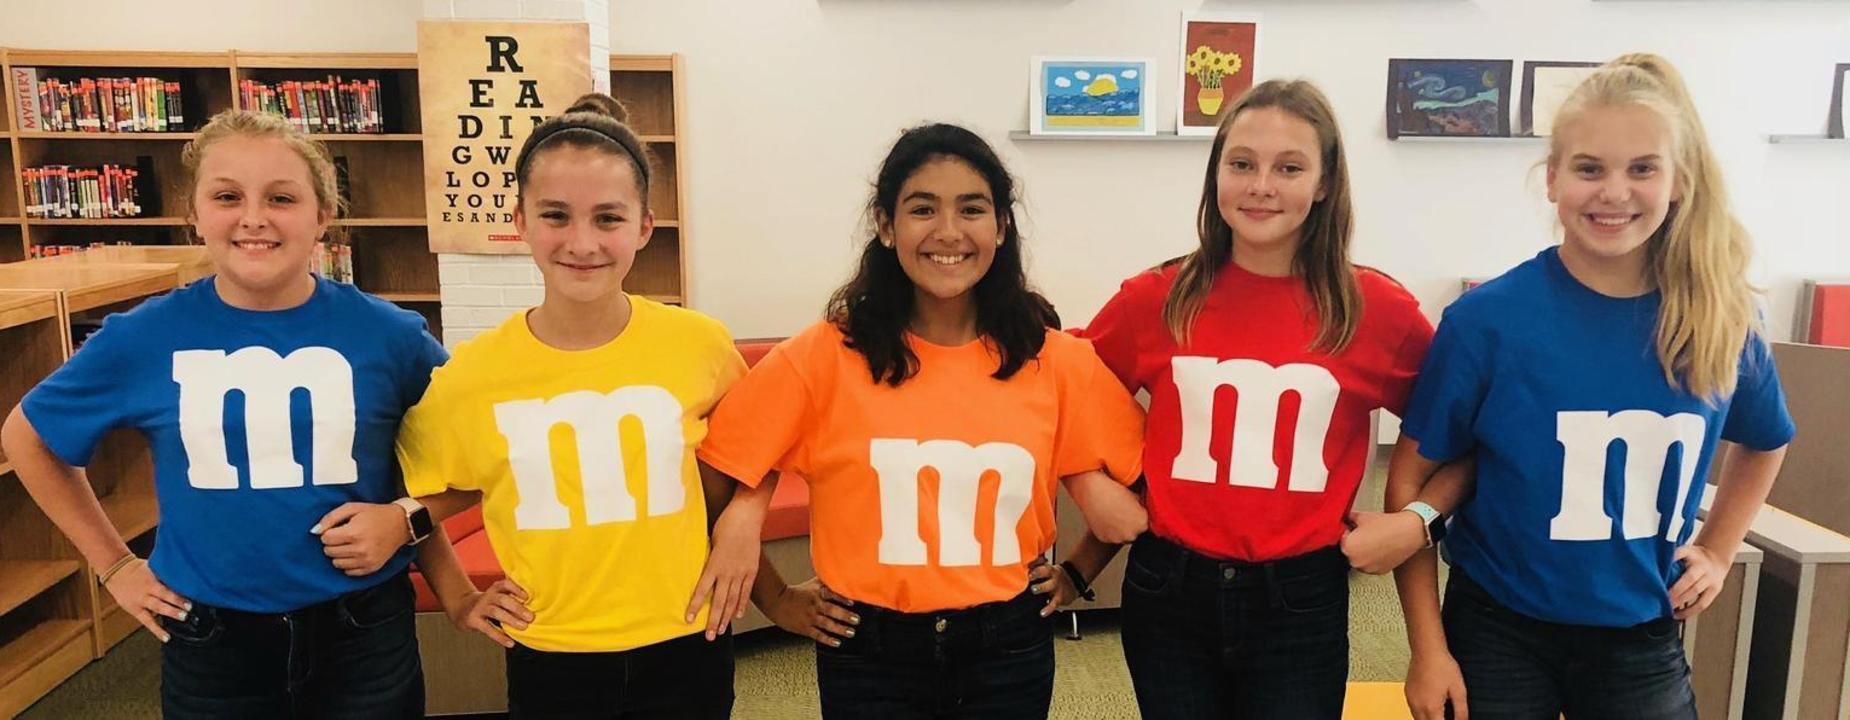 JH girls wearing M&M Tshirt